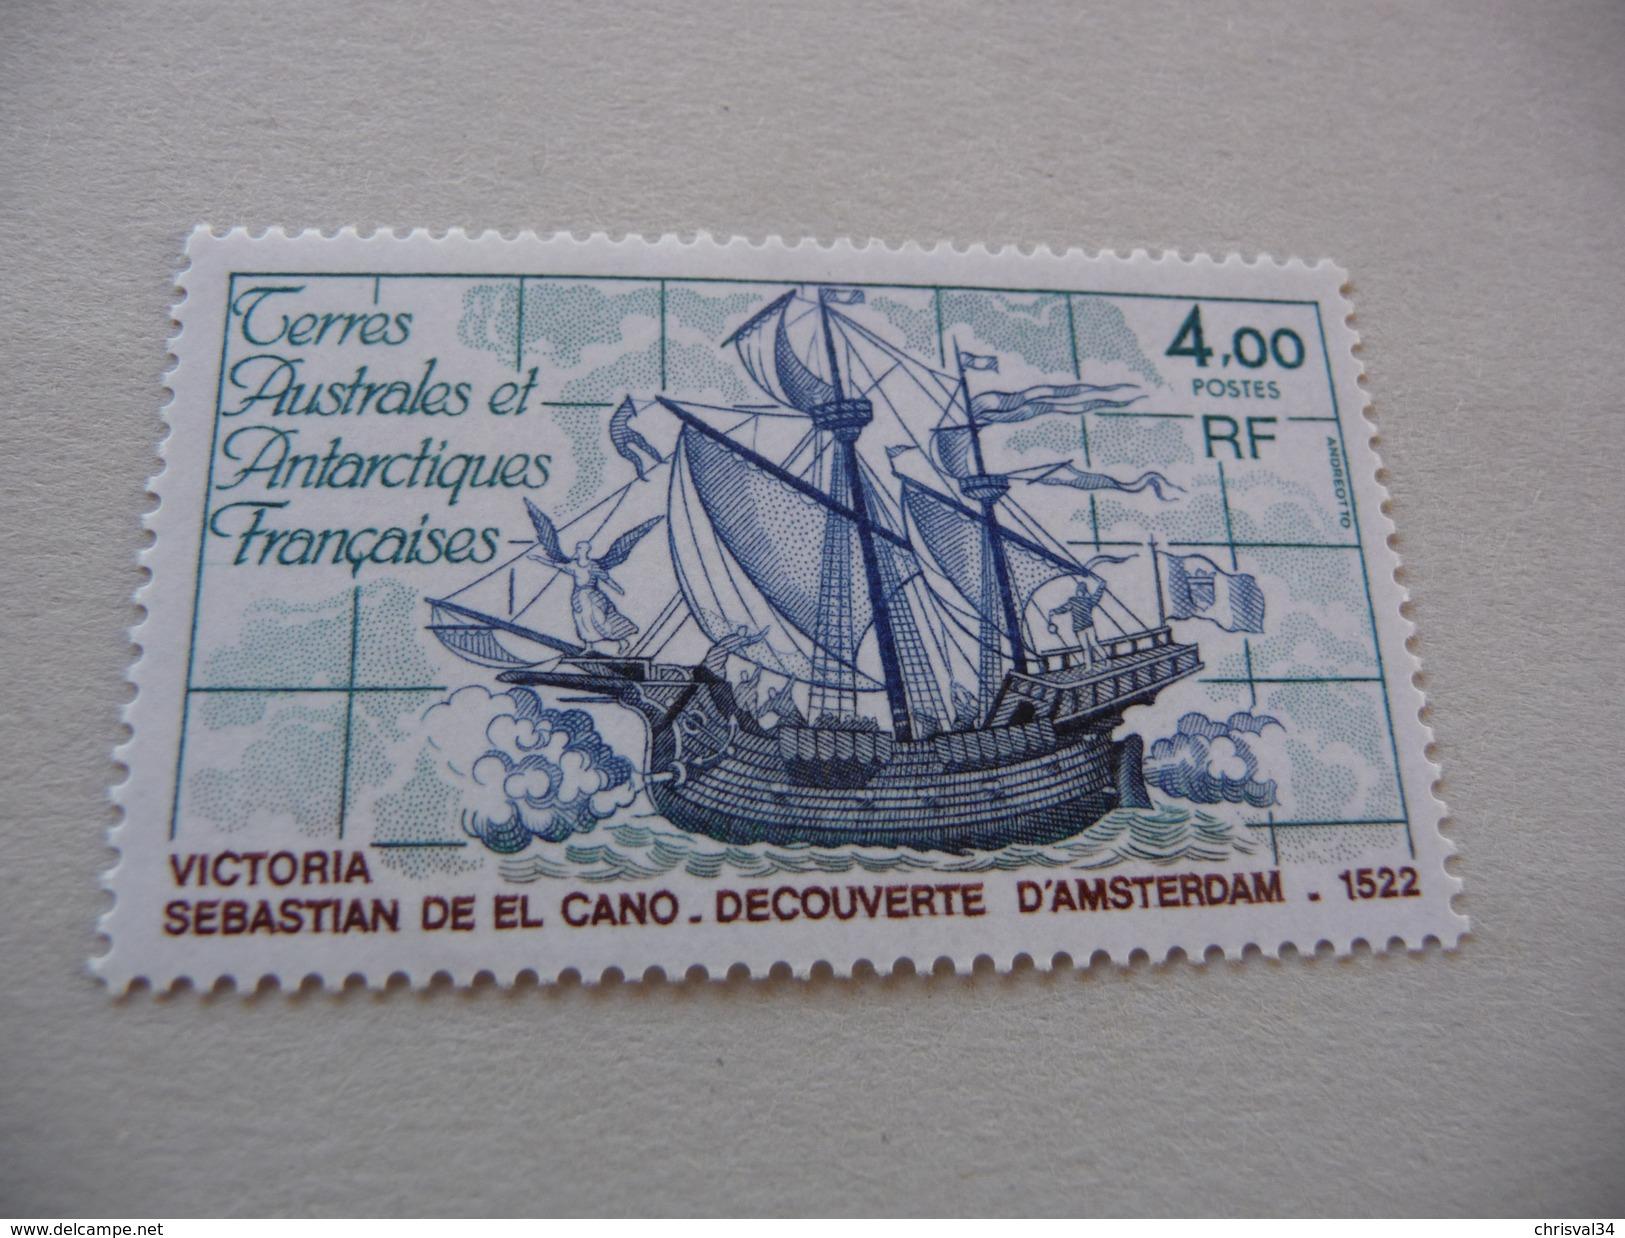 TIMBRE    TAAF     N  85       COTE  3,00  EUROS     1979    NEUF  LUXE** - Ongebruikt